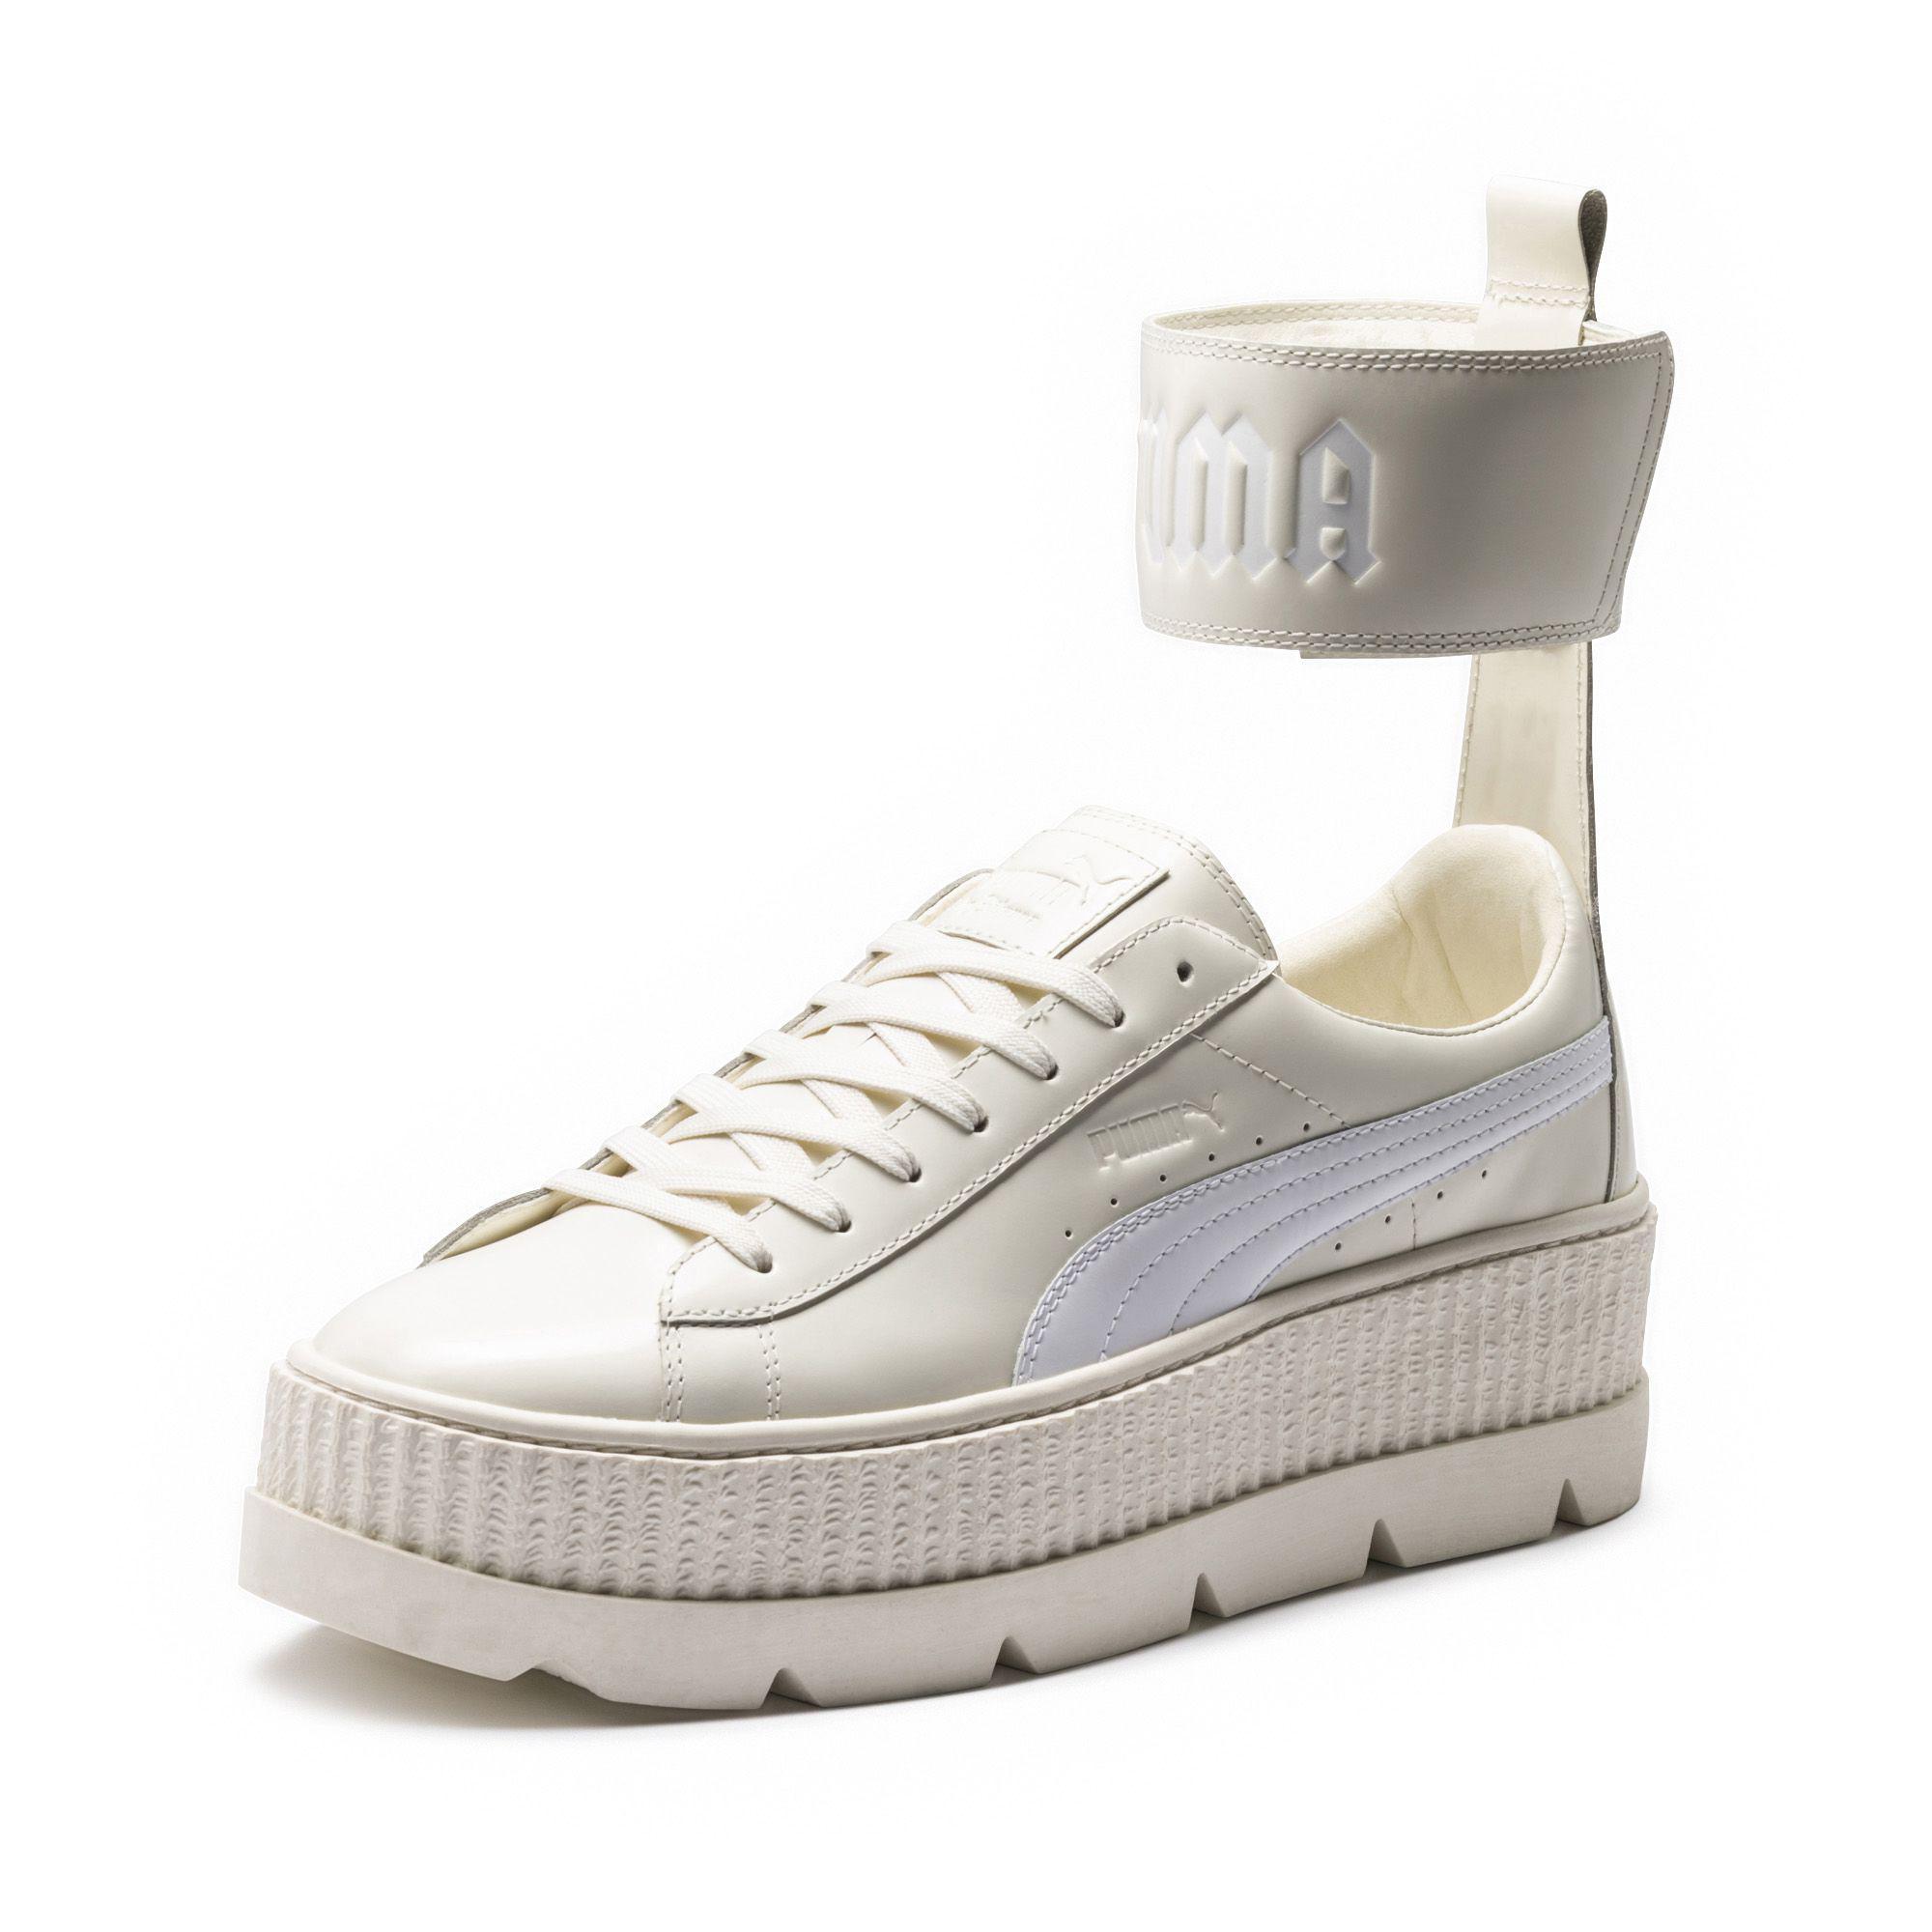 buy popular 5a0d1 d9259 White Fenty Men's Ankle Strap Sneaker